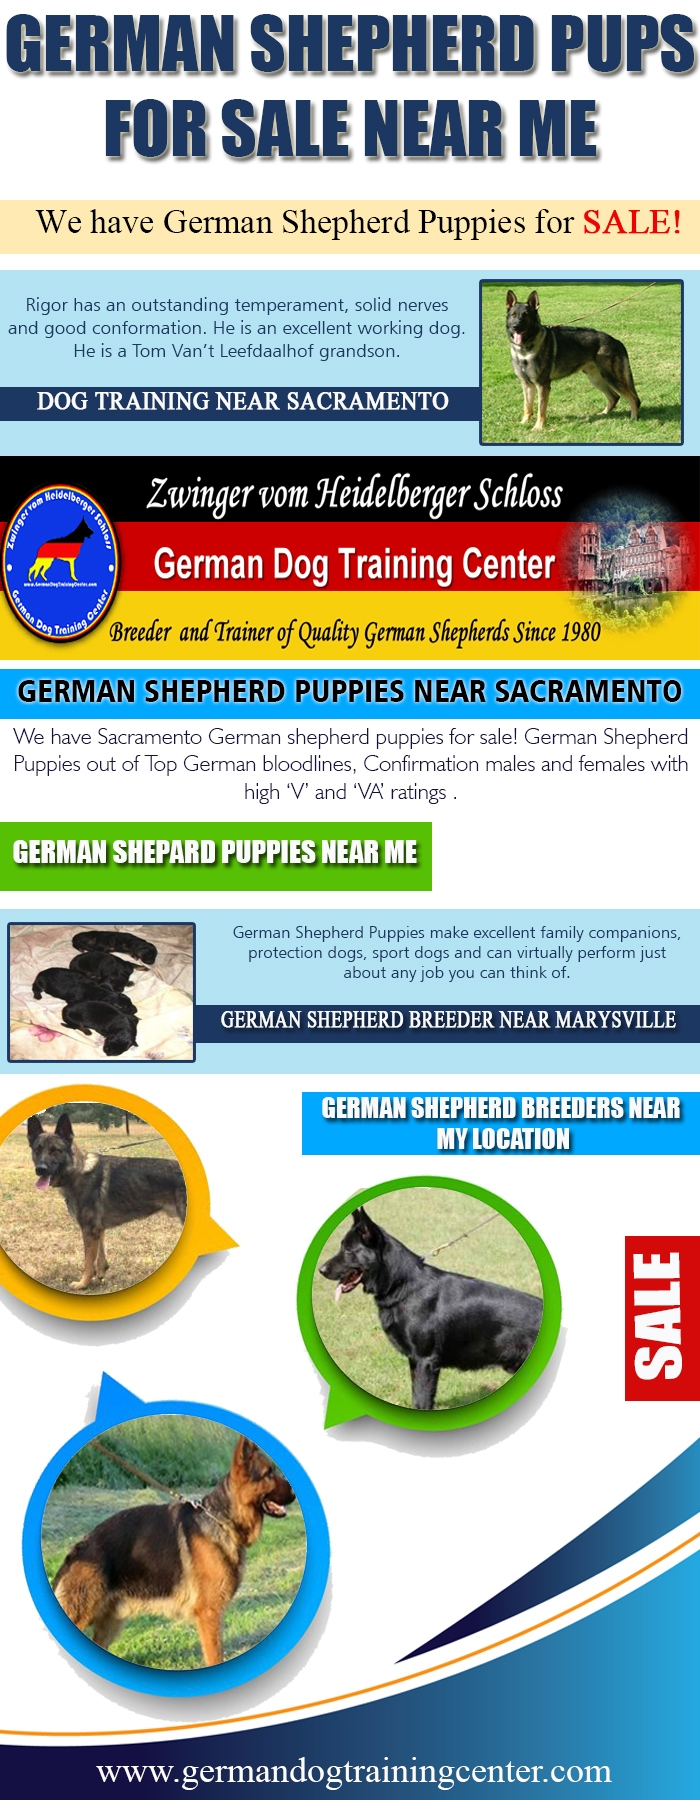 German Shepherd Pups Sale Websi - marysvilledogtraining | ello